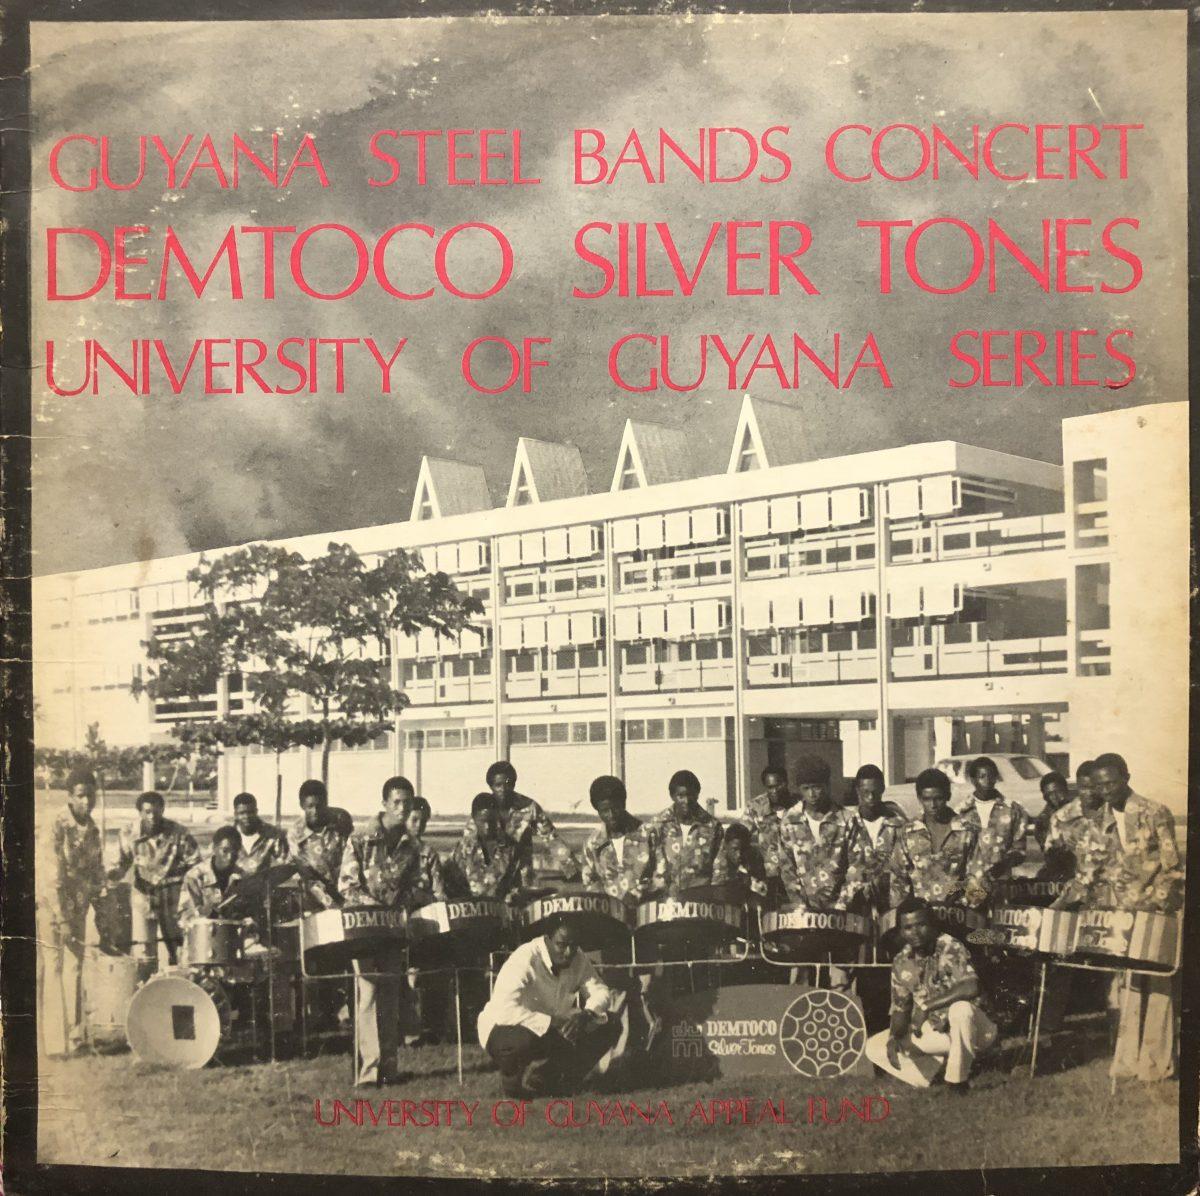 Demtoco Silver Tones - Guyana Steel Bands Concert 1973